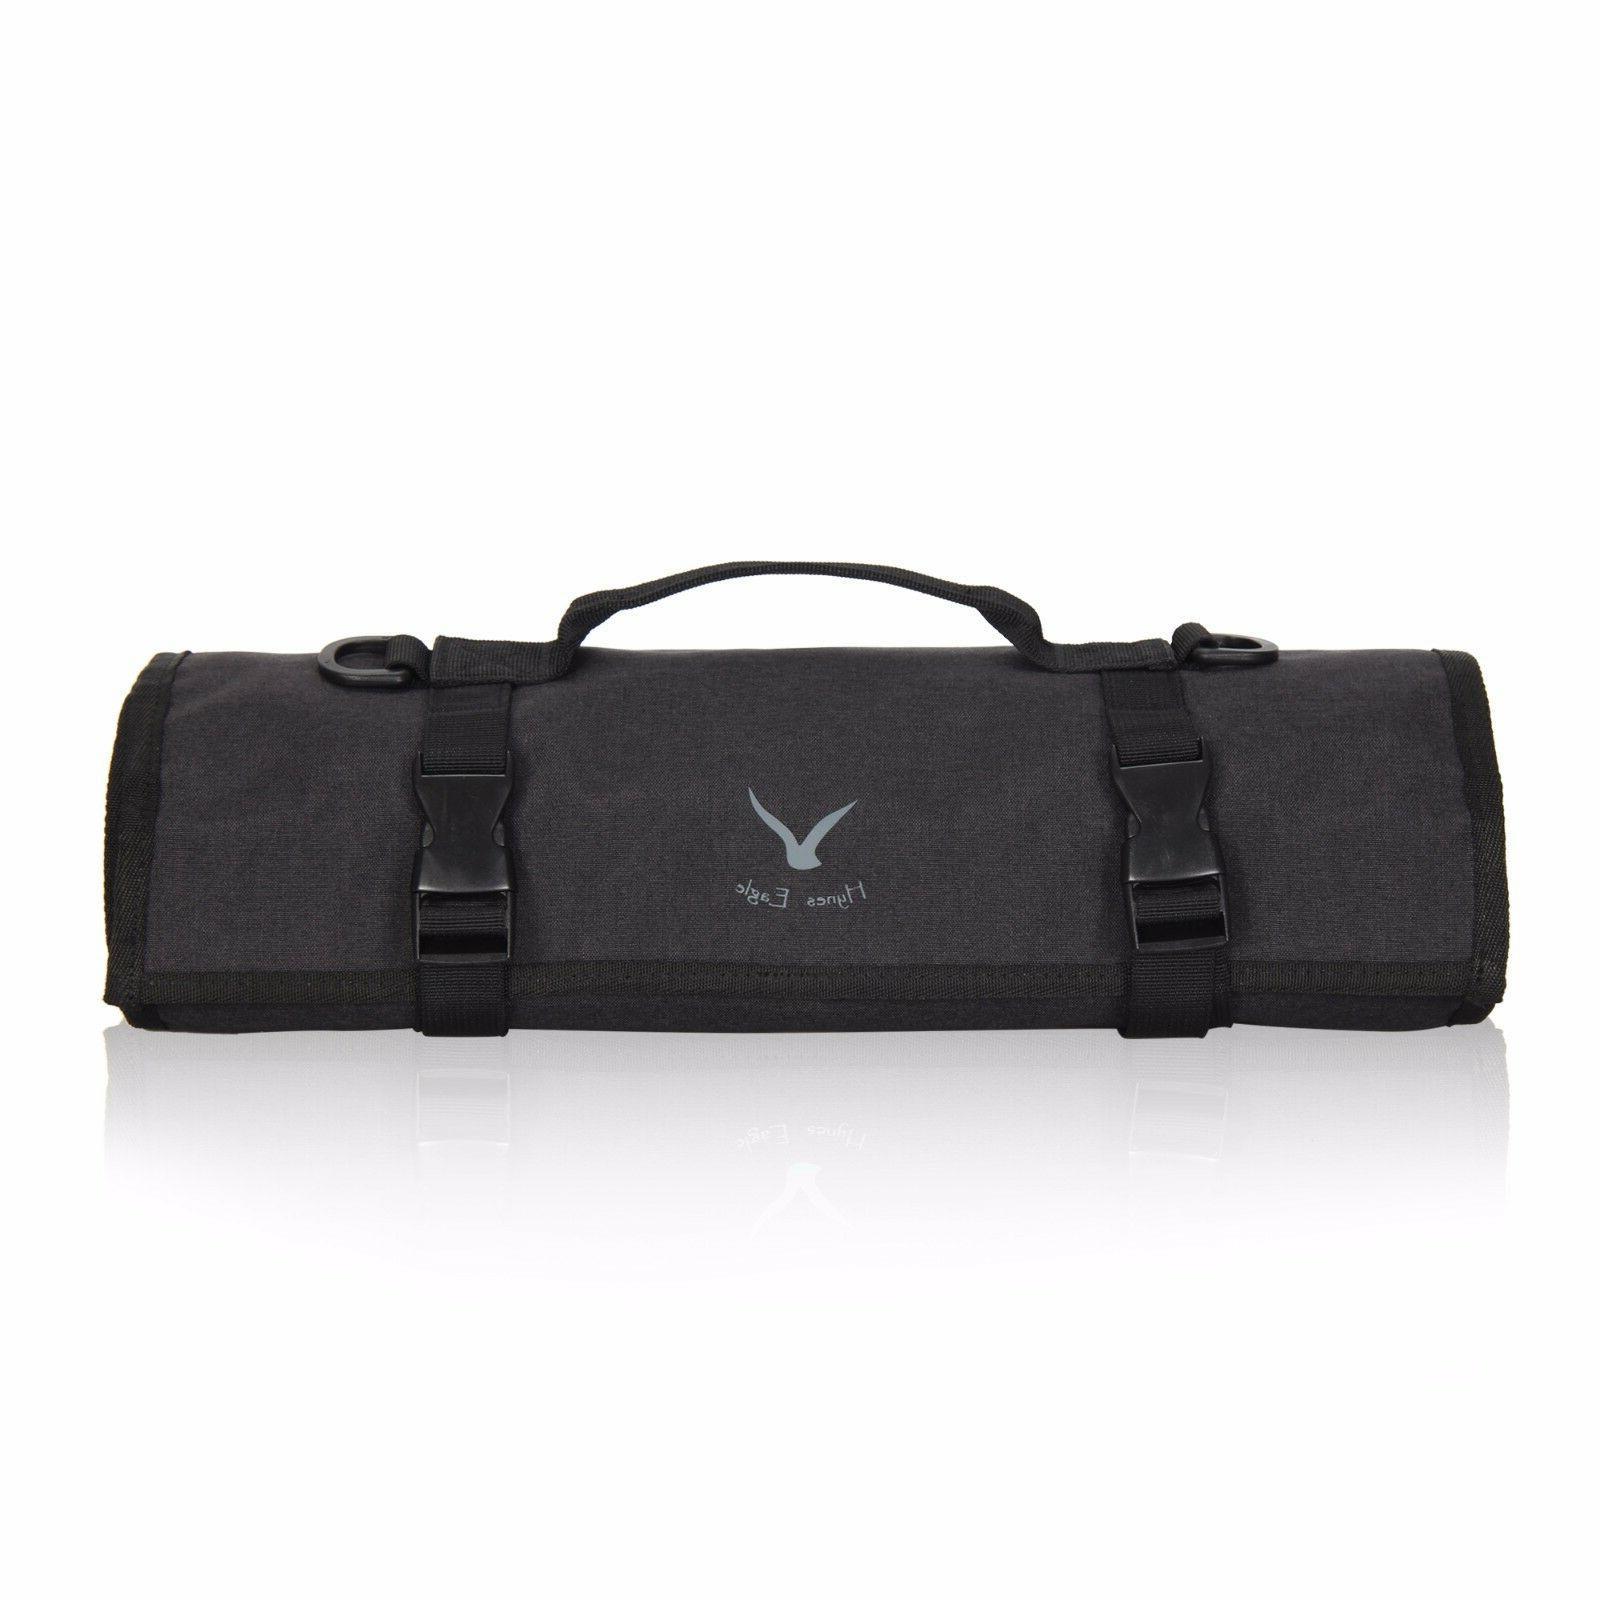 portable roll up travel bag hanging compression